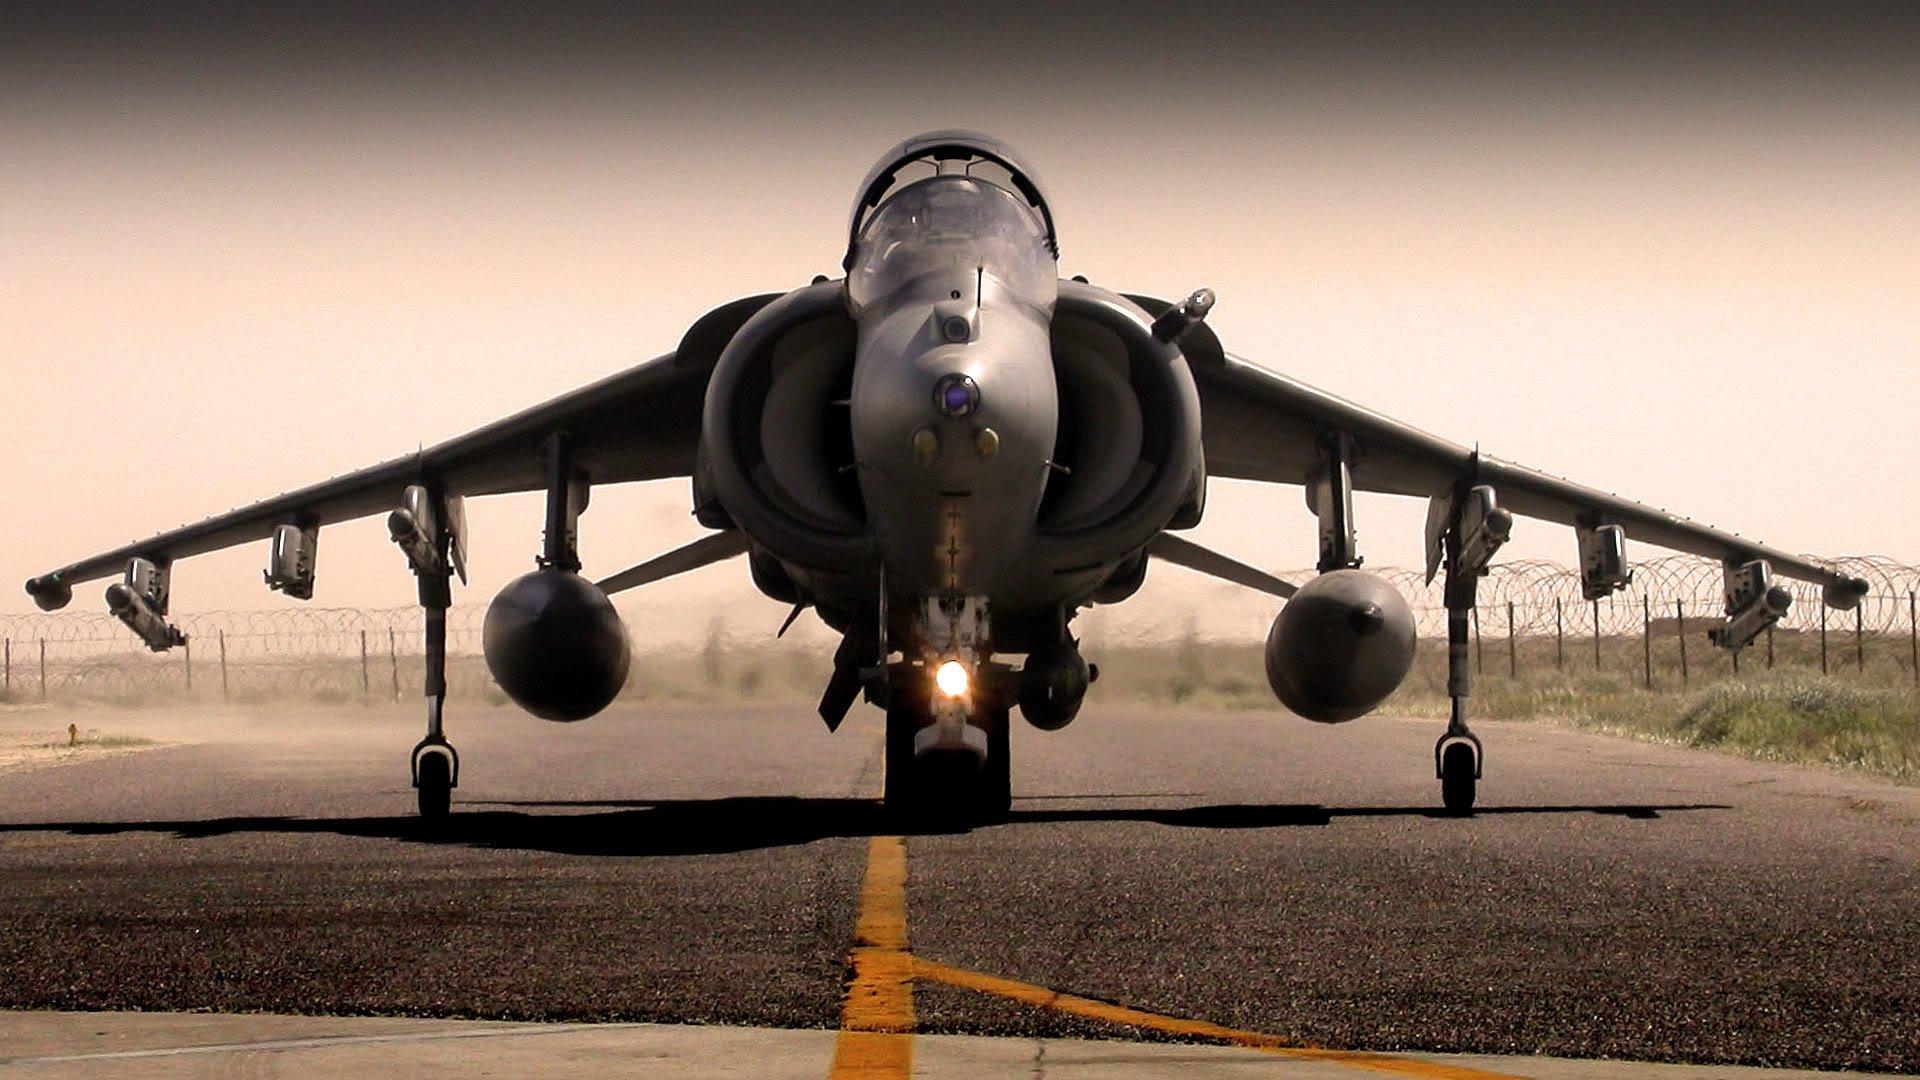 Hd Wallpaper Jet Fighter 743202 Hd Wallpaper